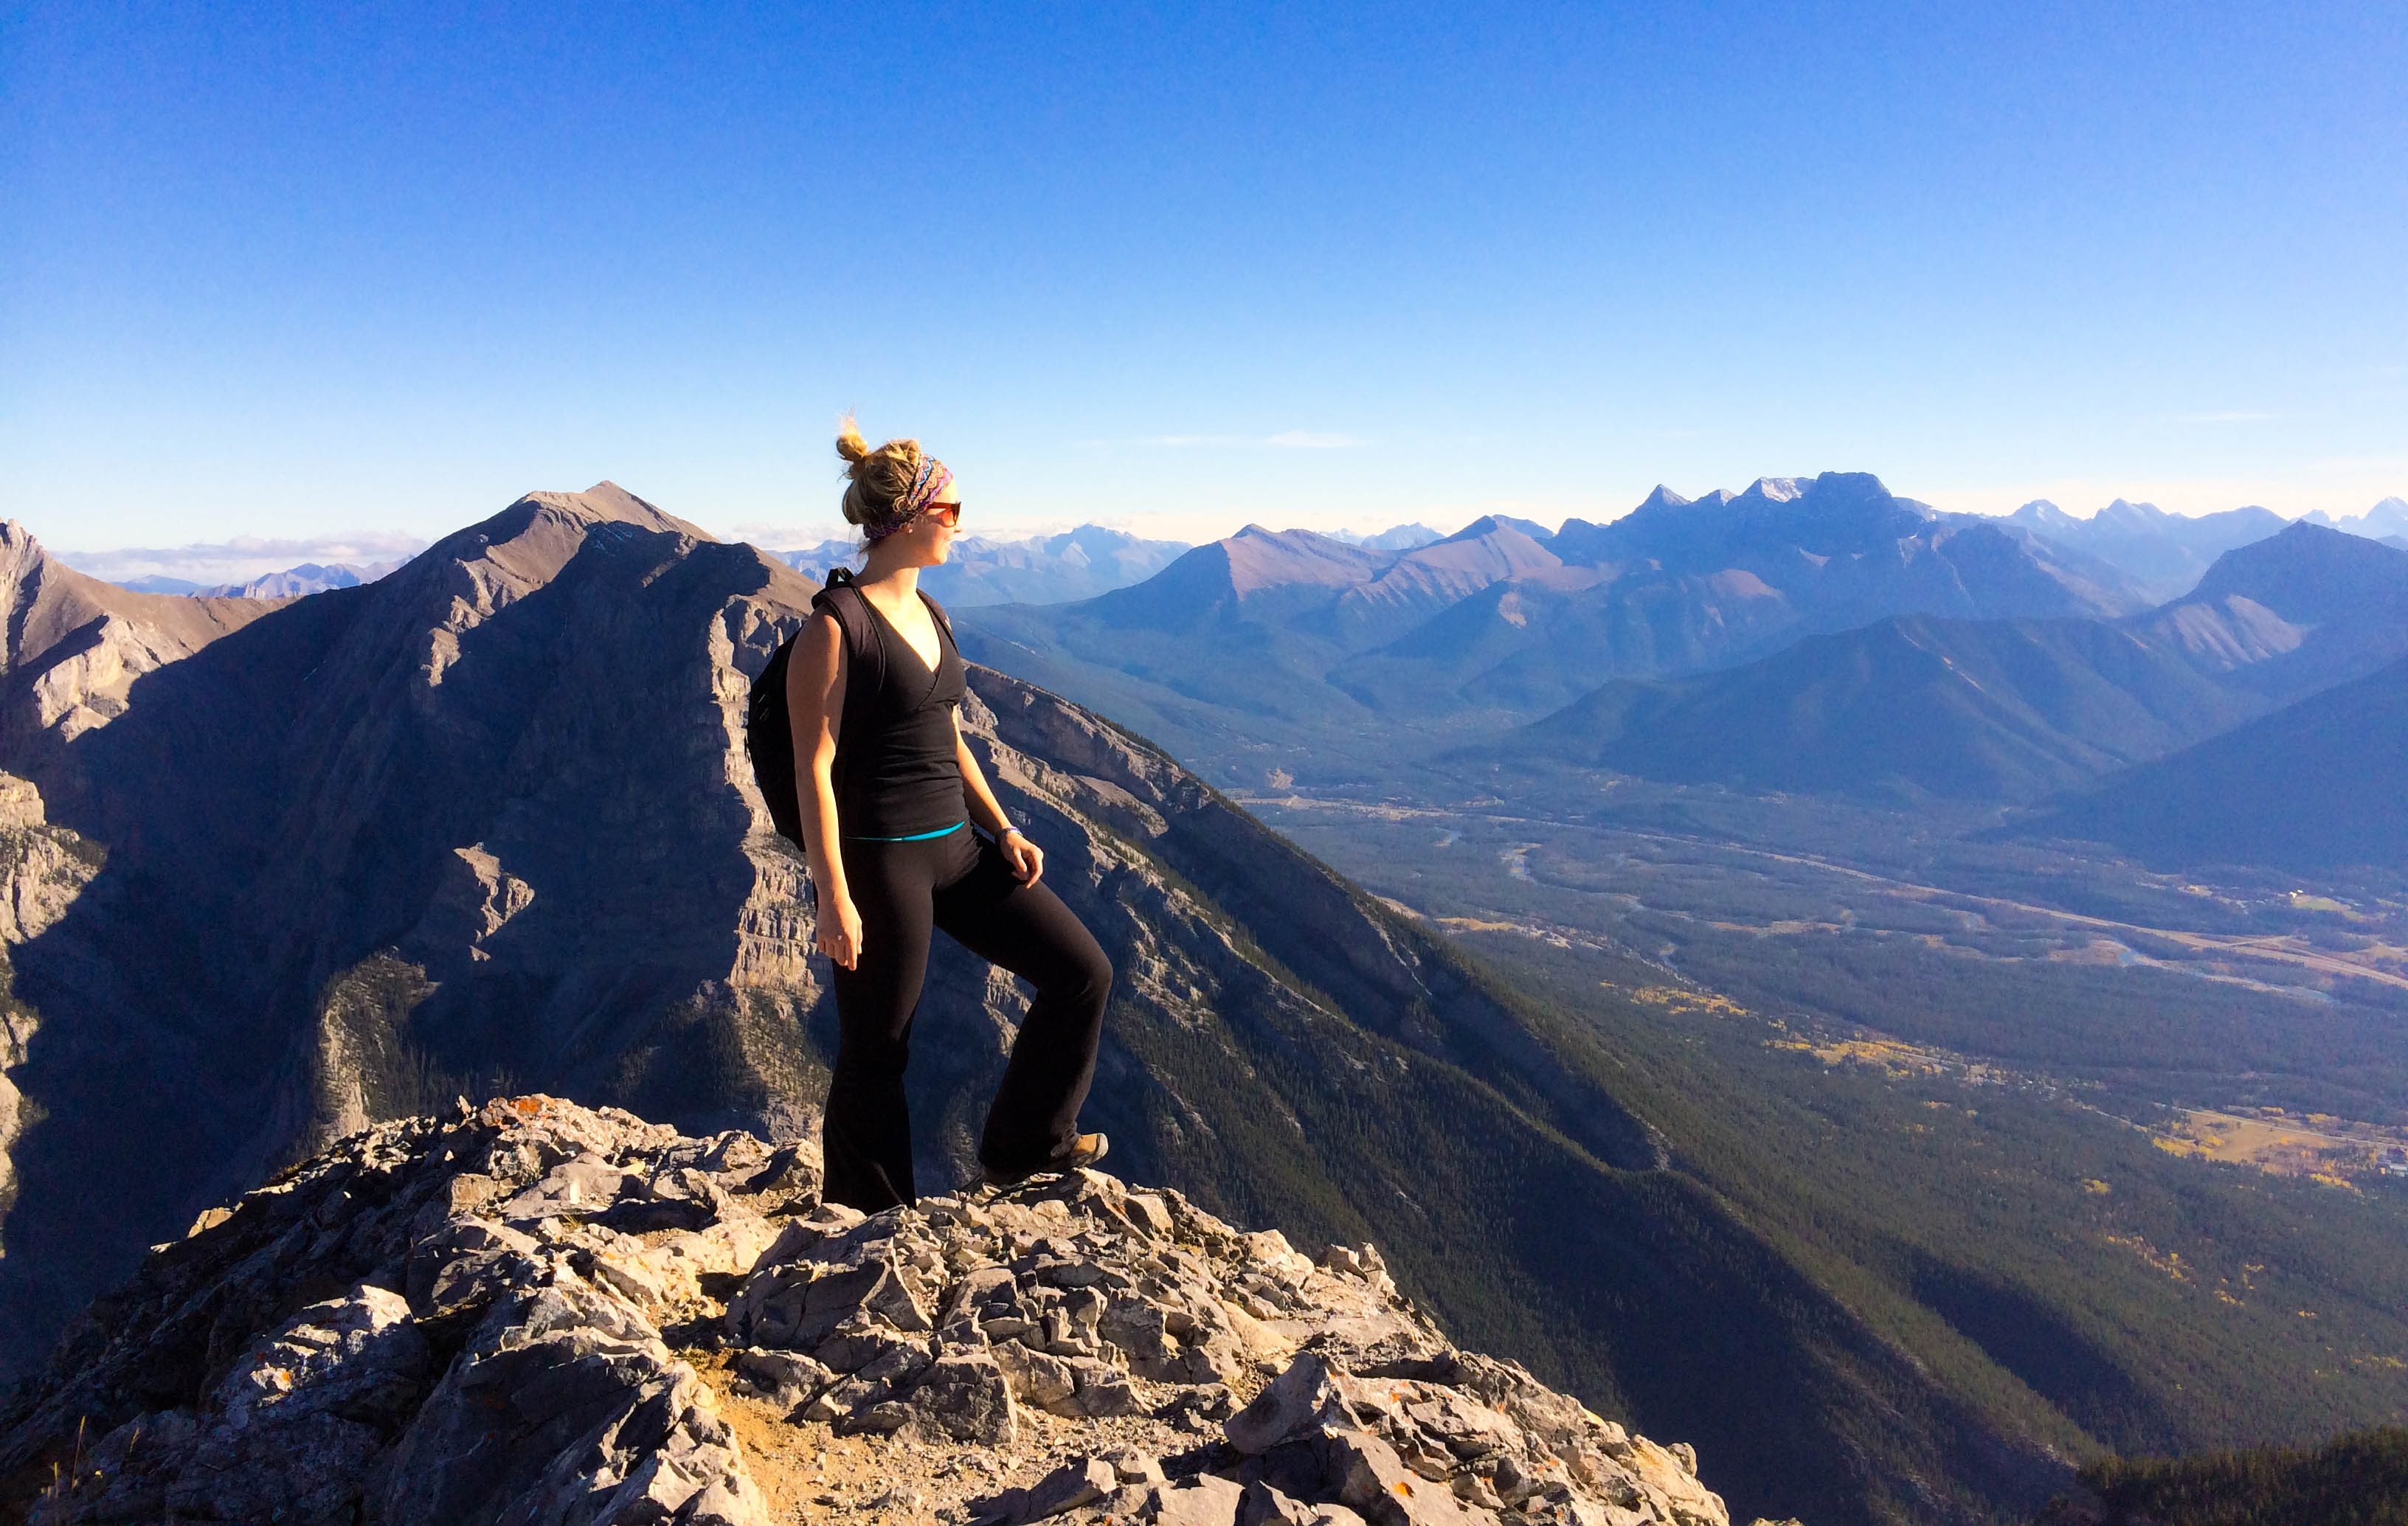 mount lady macdonald mountain hiking in canmore alberta canada